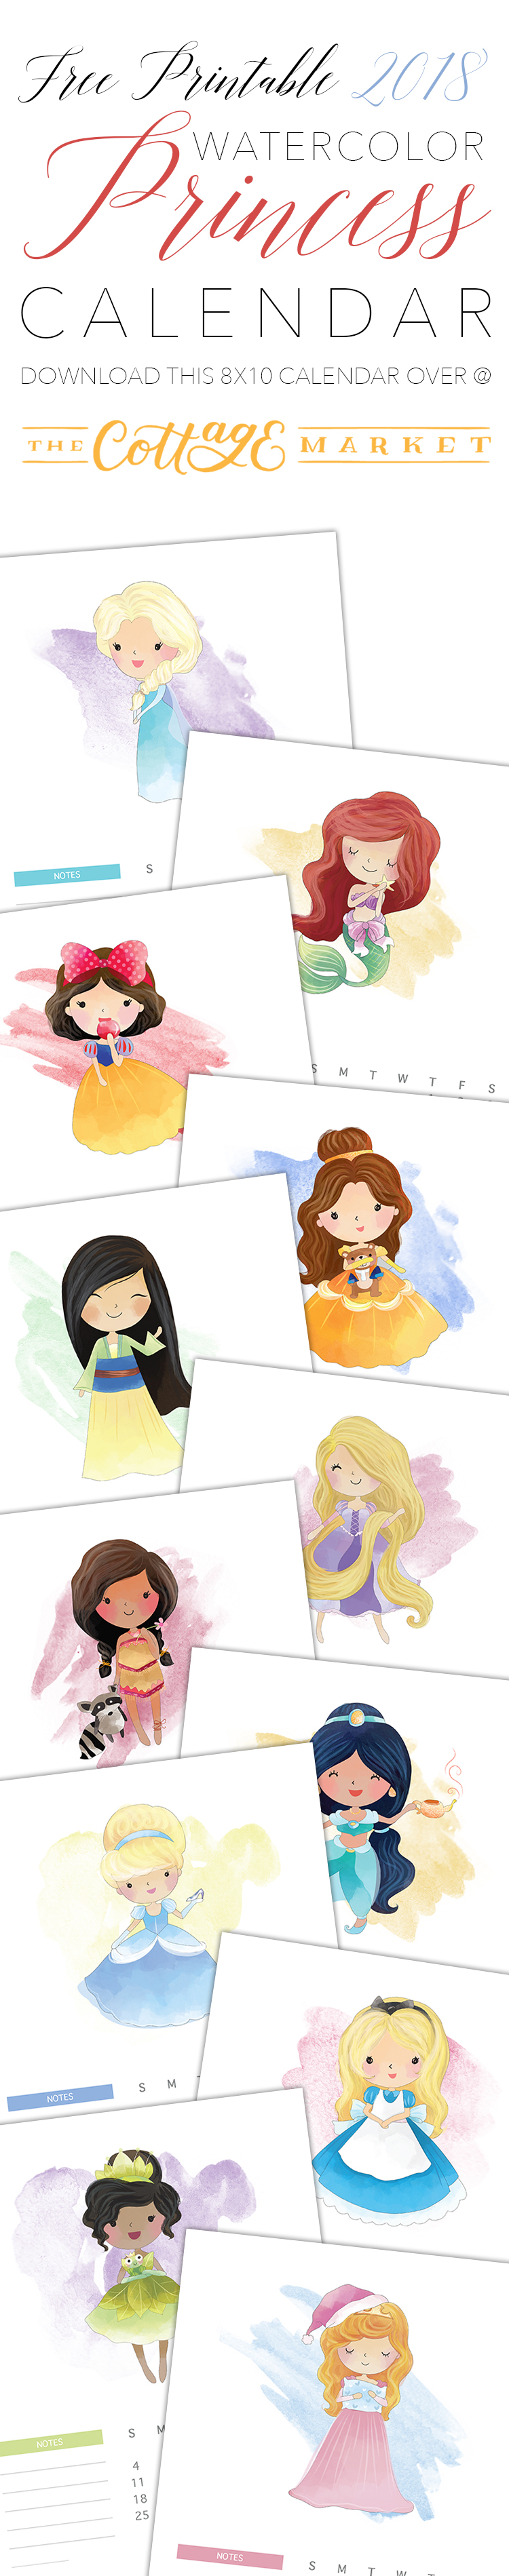 The 2018 Watercolor Princess Calendar features adorable Disney princesses